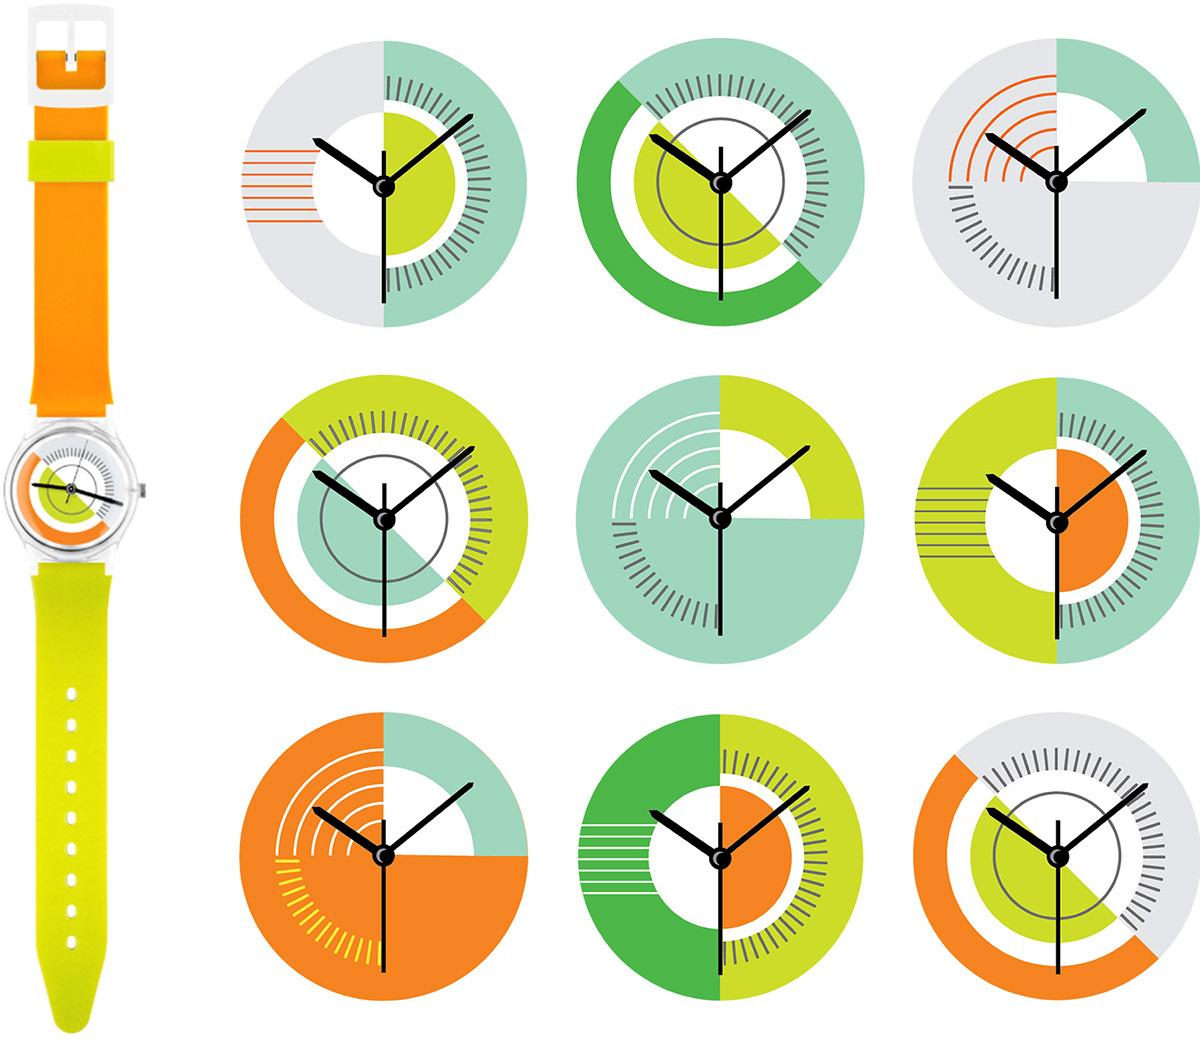 watch WatchDesign modernwatch accessories geometric fashionwatch plastic color Watches Urban